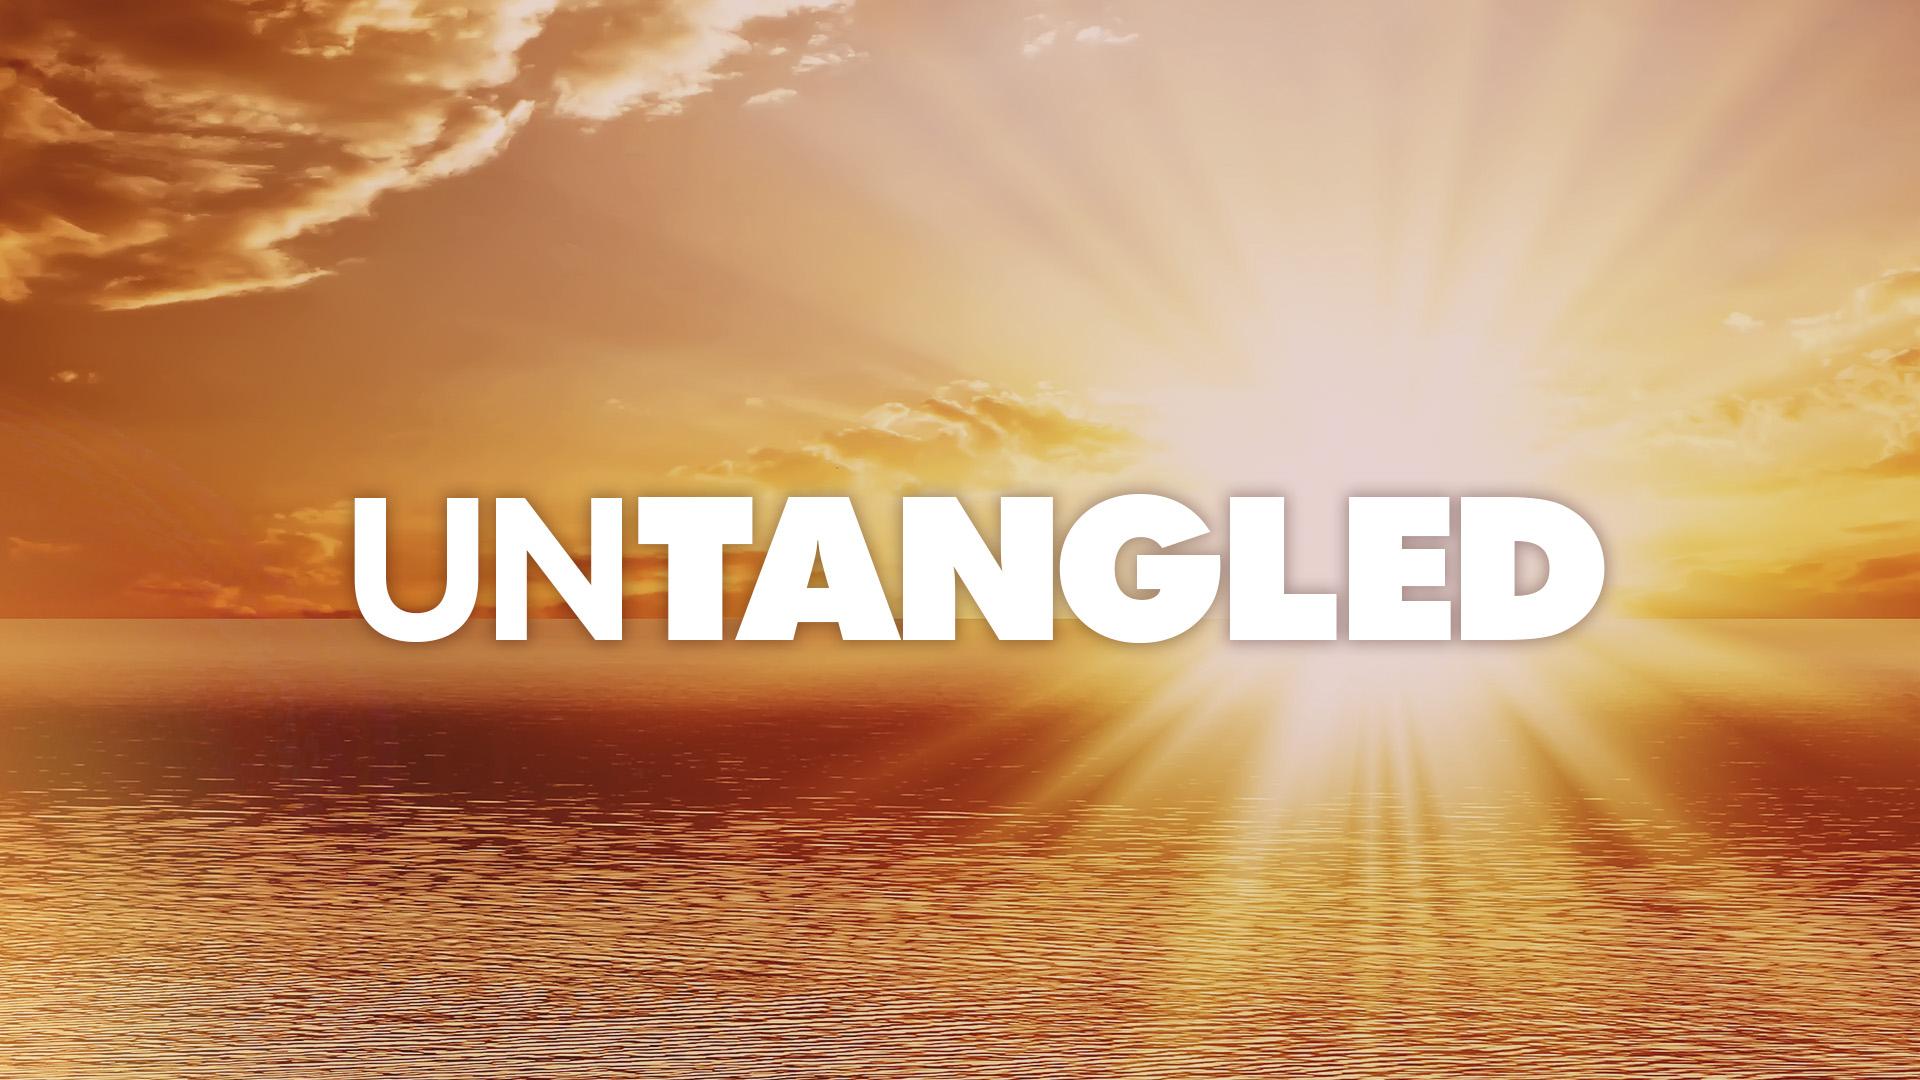 Untangled Message Series - Sunrise title